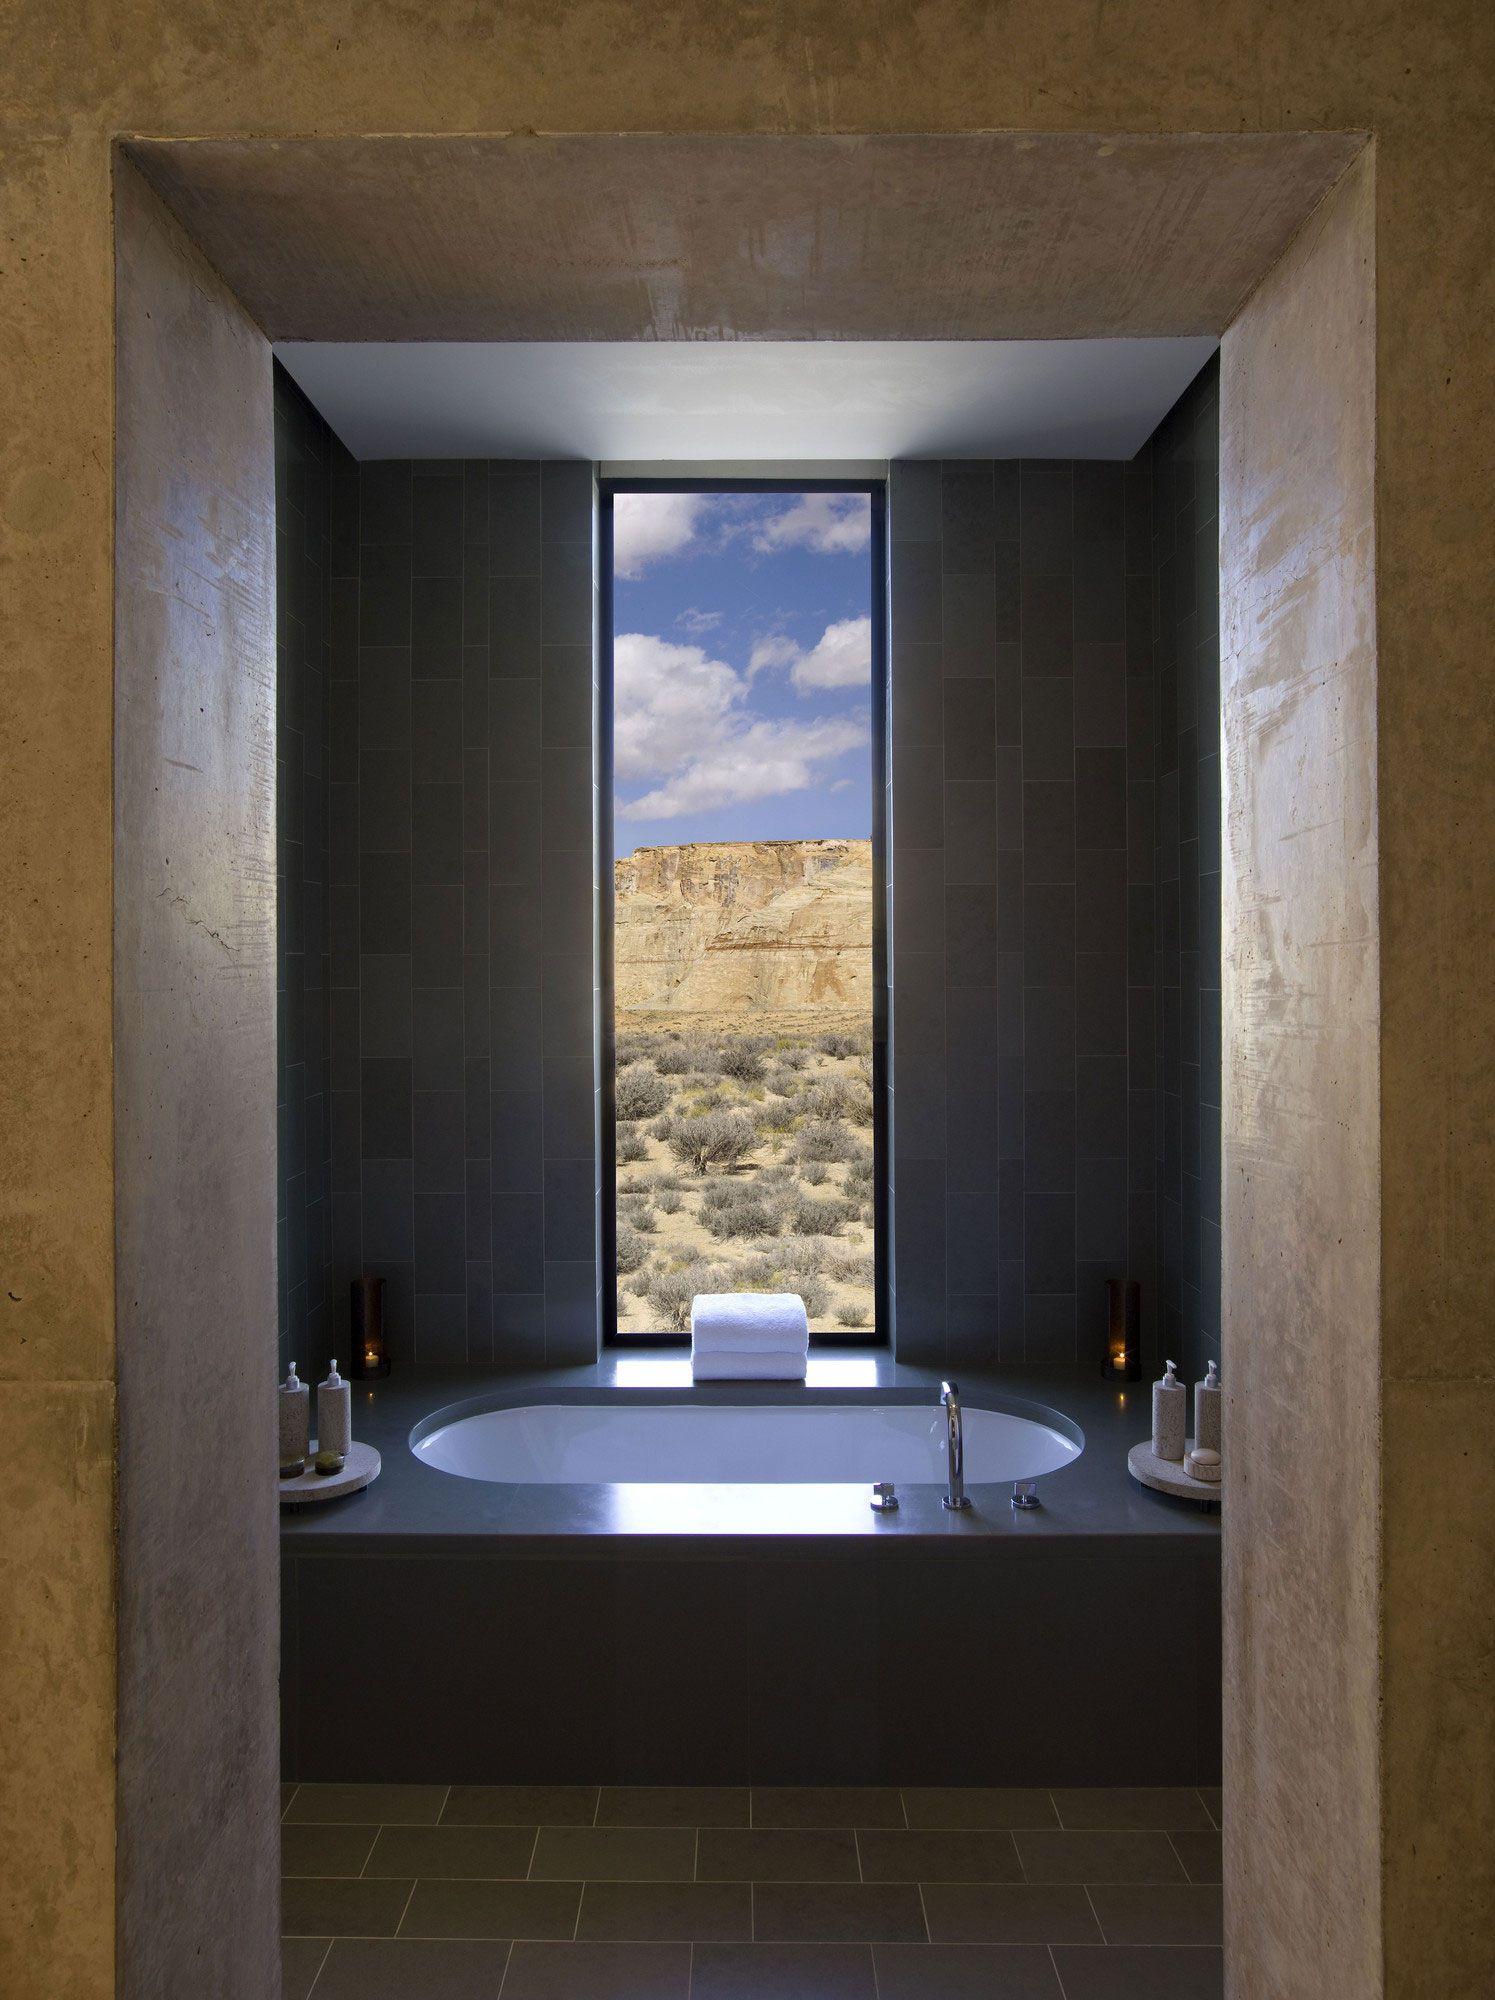 Amangiri-Luxury-Resort-Hotel-in-Canyon-Point-12-1